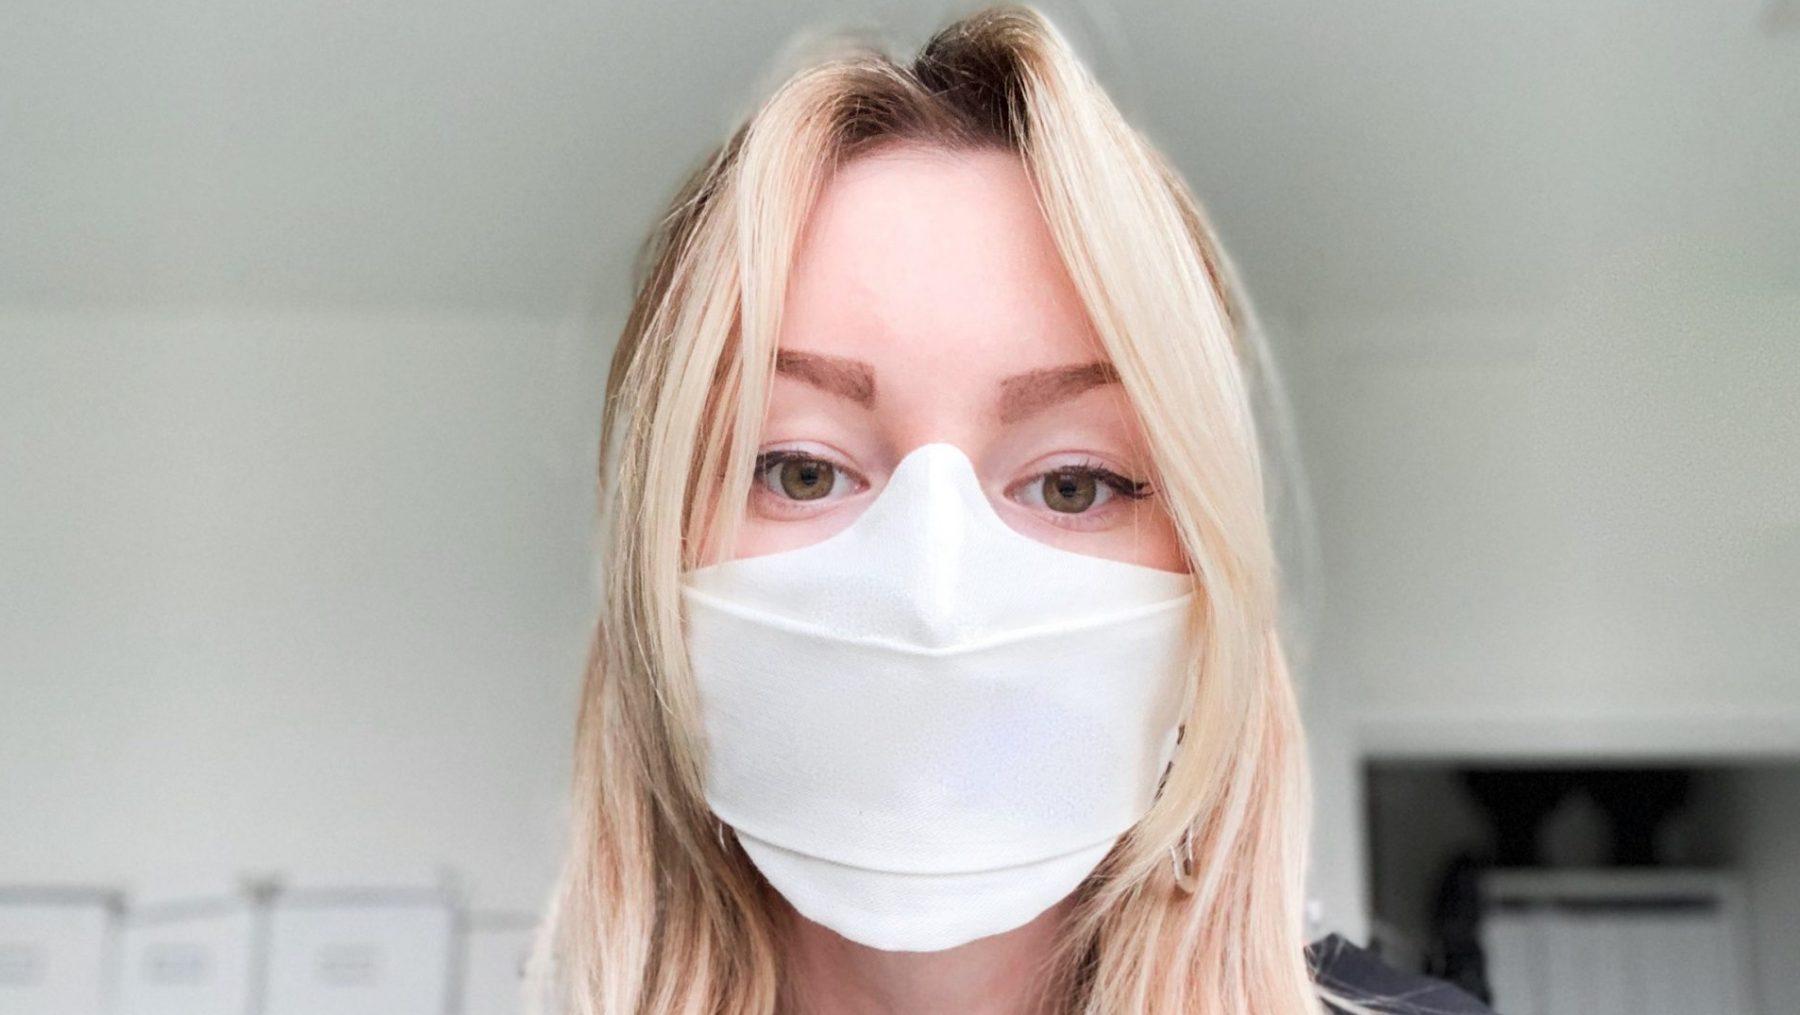 Modeontwerper Danya (26) maakt mondkapjes van afgekeurde tampons